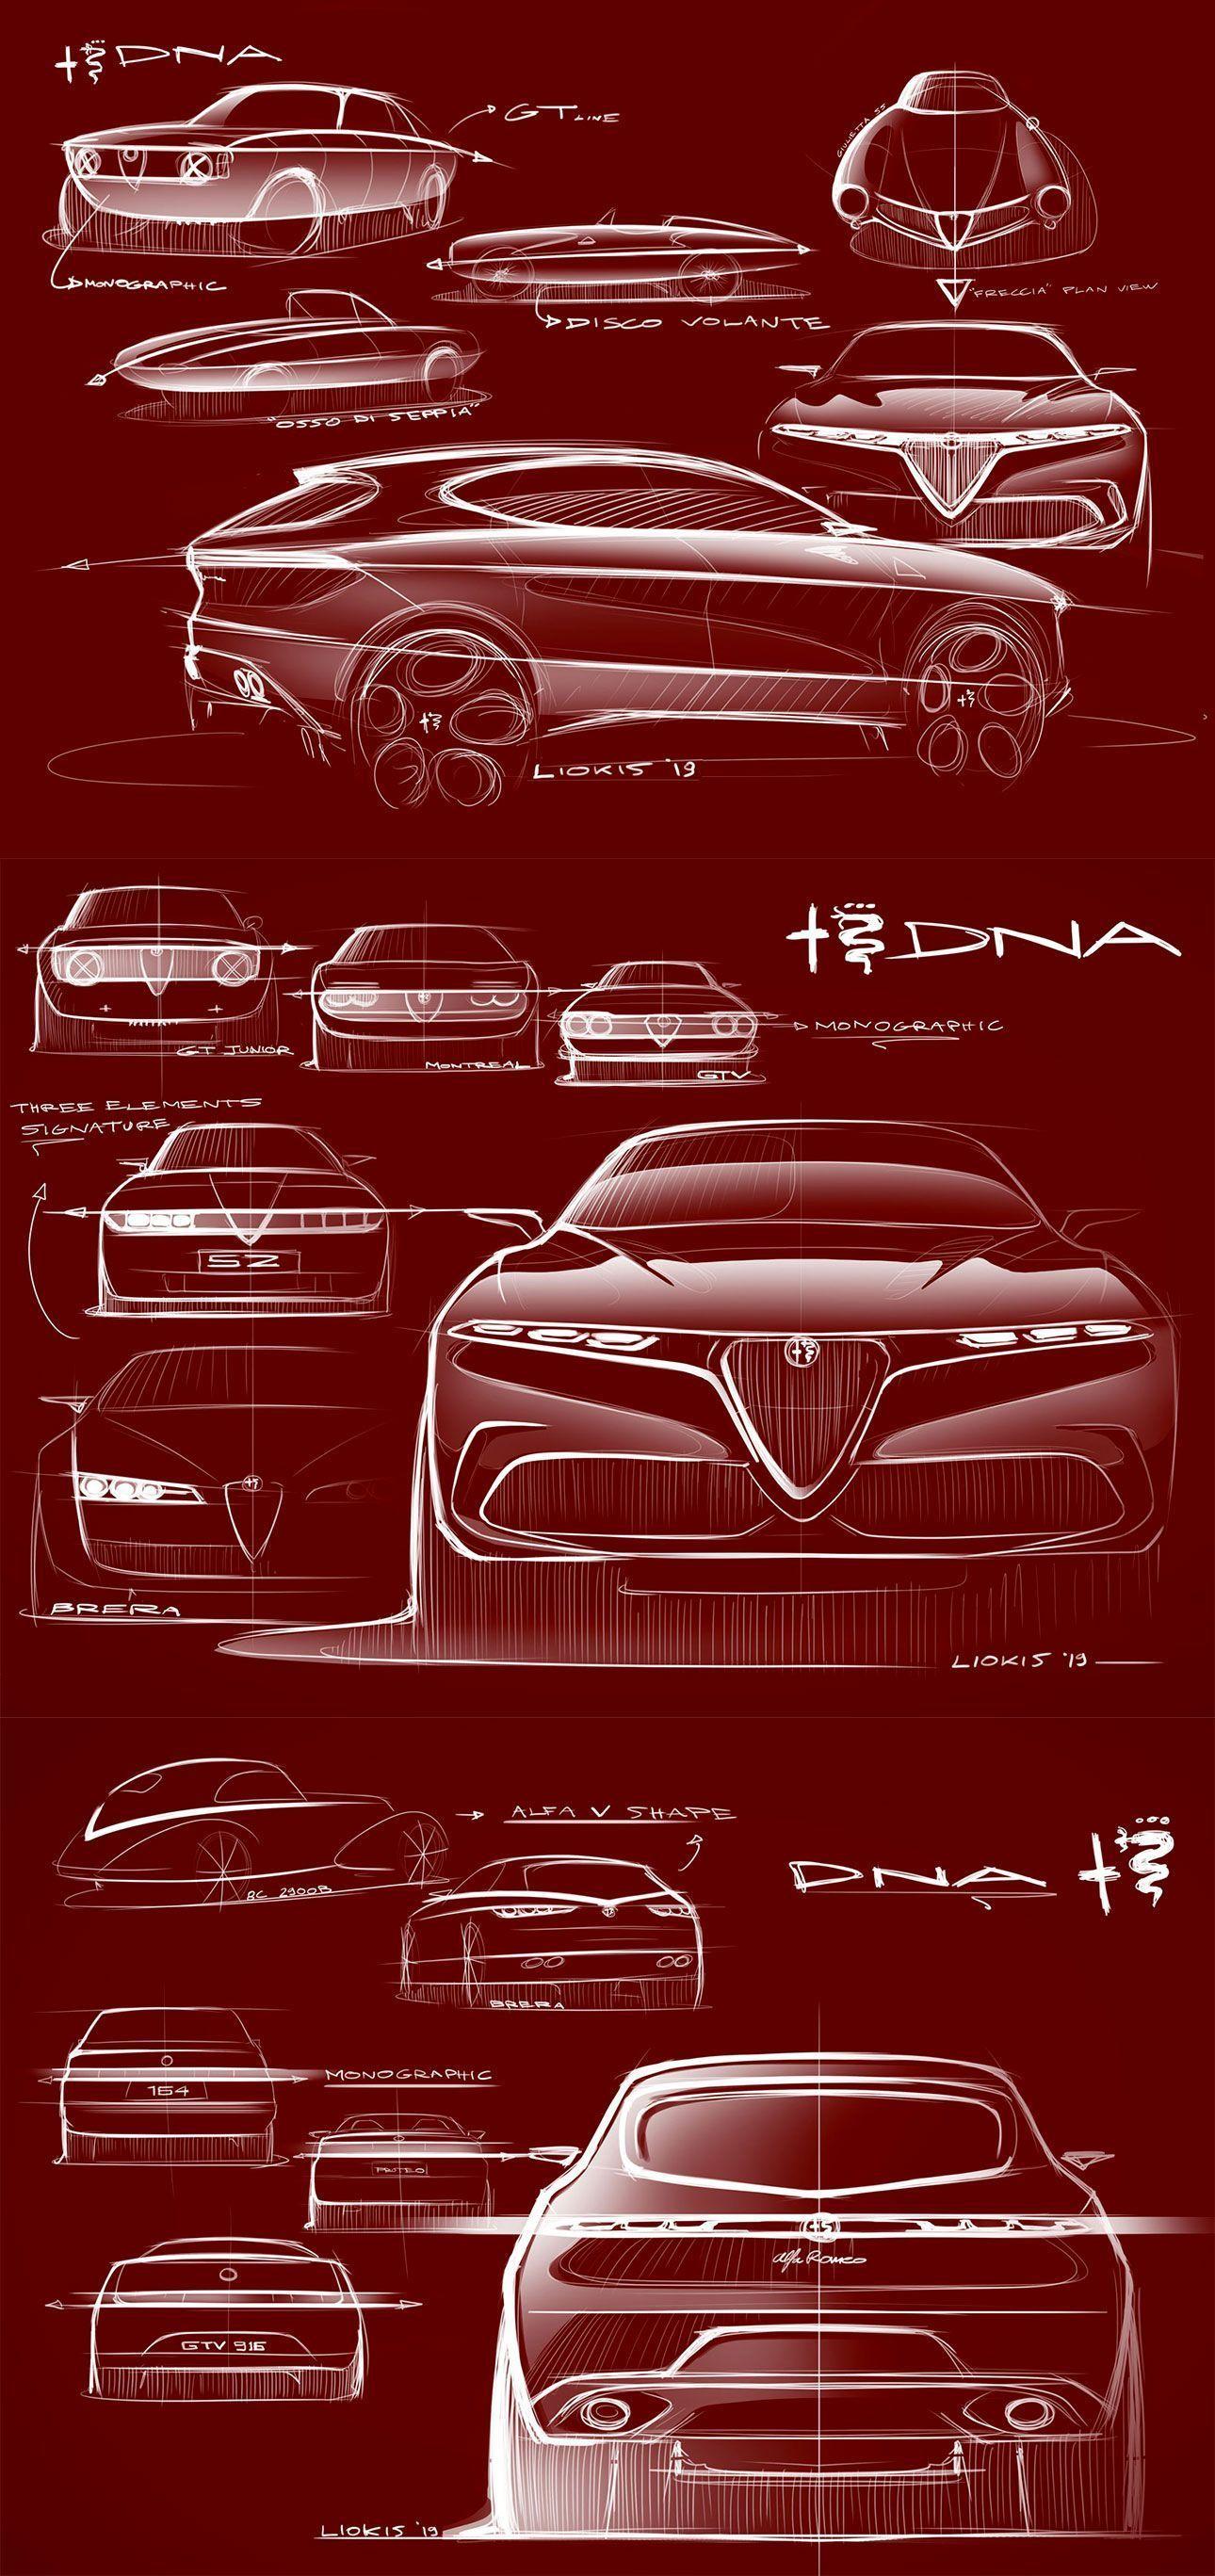 Alfa Romeo Tonale Concept: design sketches by Senior Exterior Designer Alexandros Liokis  #AlfaRomeo #SUV #Design #conceptcar #cardesign #conceptcars #futuristiccars #design #futuristic #autodesign #automotive #car #automotivedesign #cargram #sketch #designsketch #carsketch #cardesignsketch #industrialdesignsketch #cardesignworld #cardesignercommunity #cardesignpro #carbodydesign #carrendering